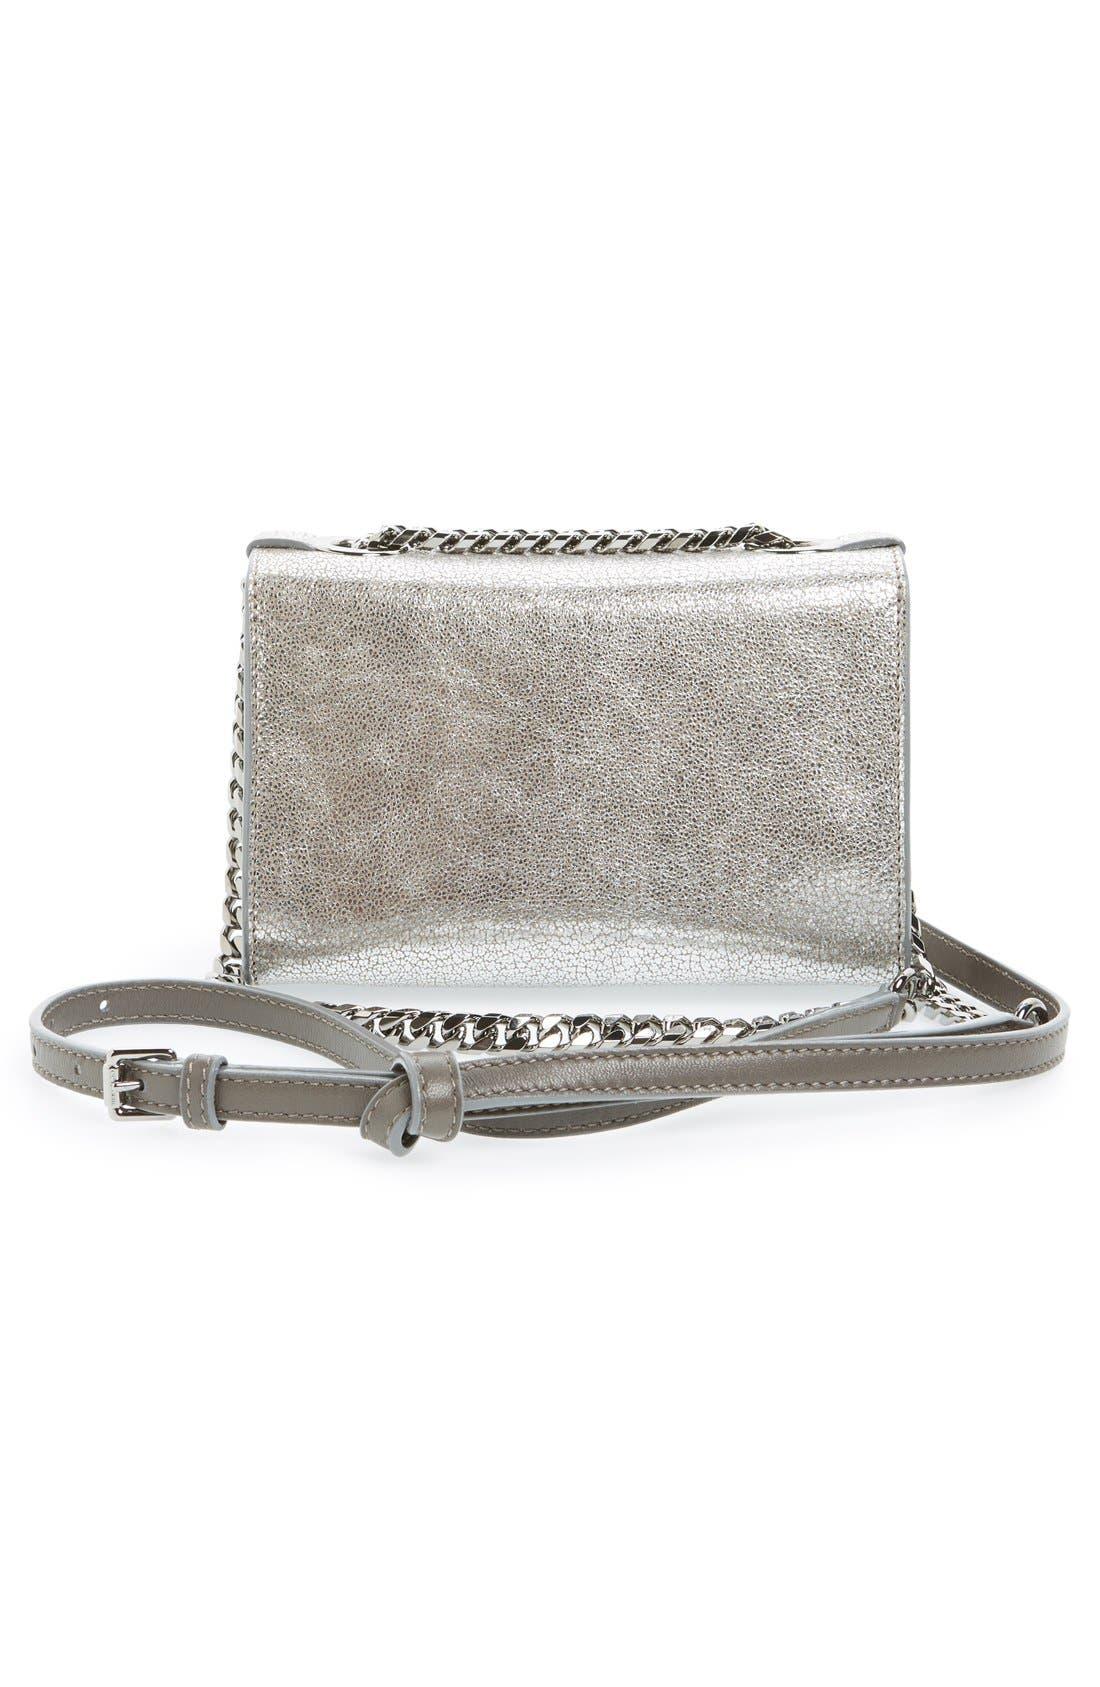 Rebel Mini Metallic Leather Crossbody Bag,                             Alternate thumbnail 3, color,                             040